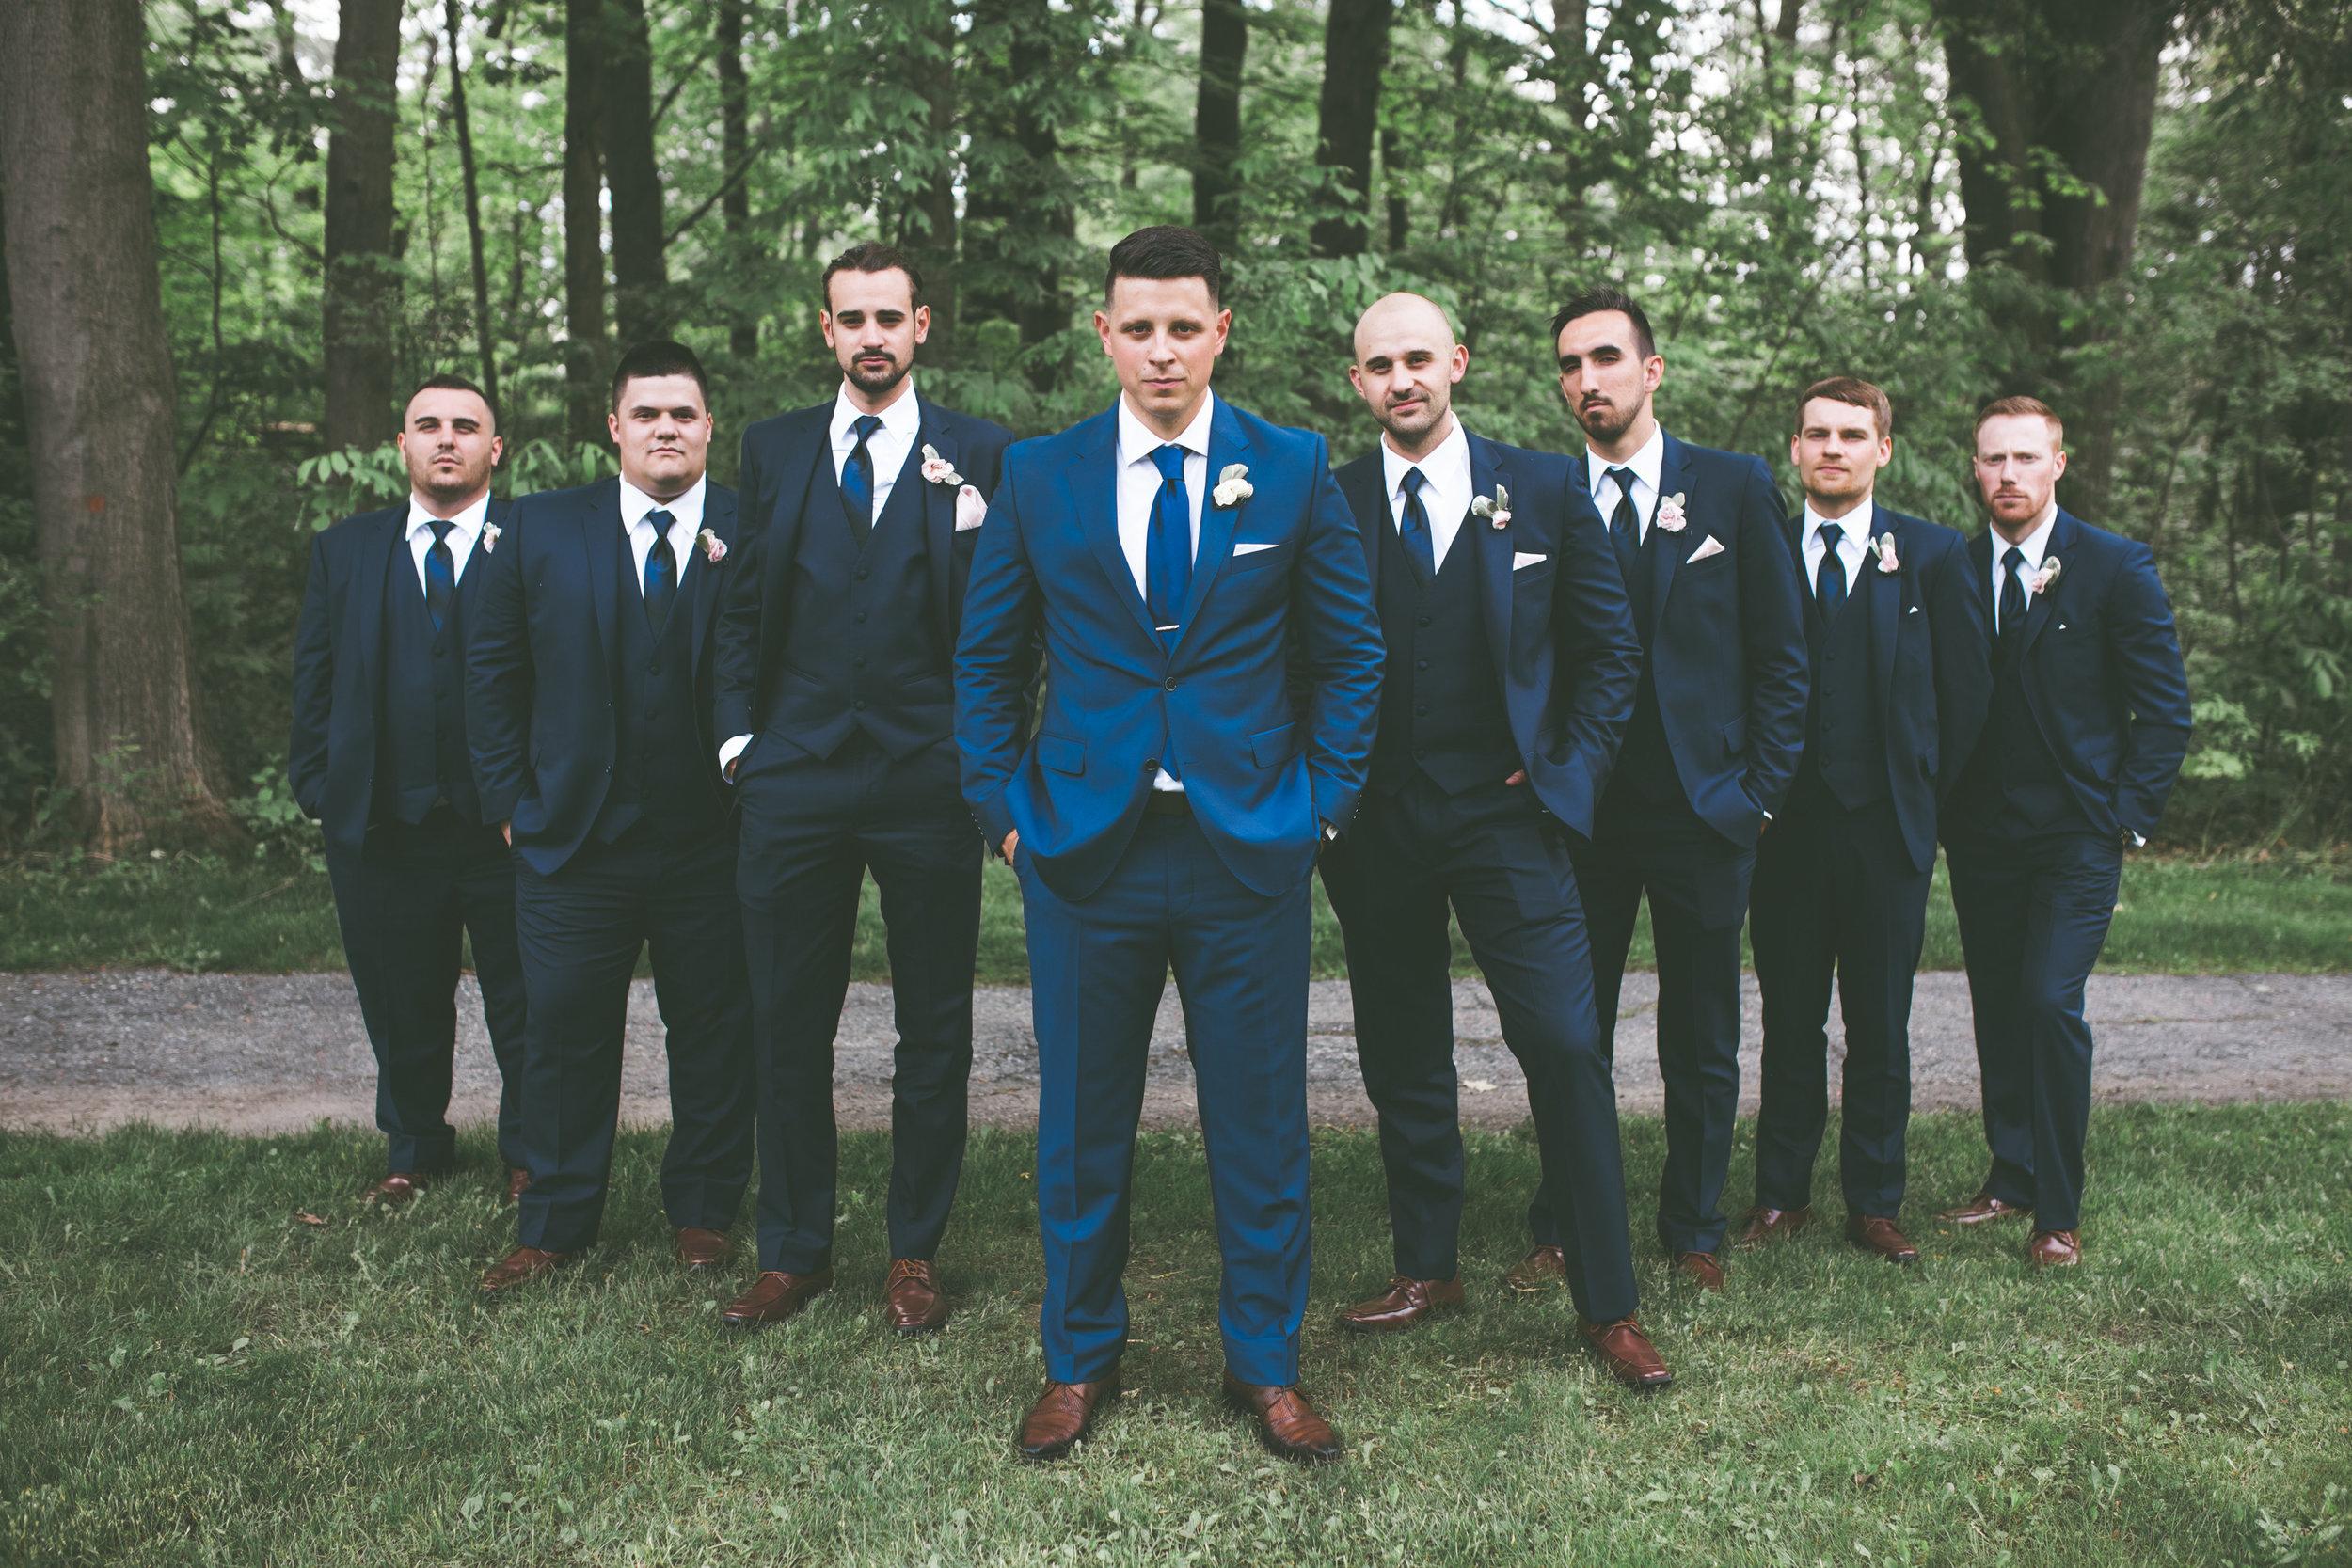 ashley___dario_wedding___lifesreel_danielcaruso___1129.jpg